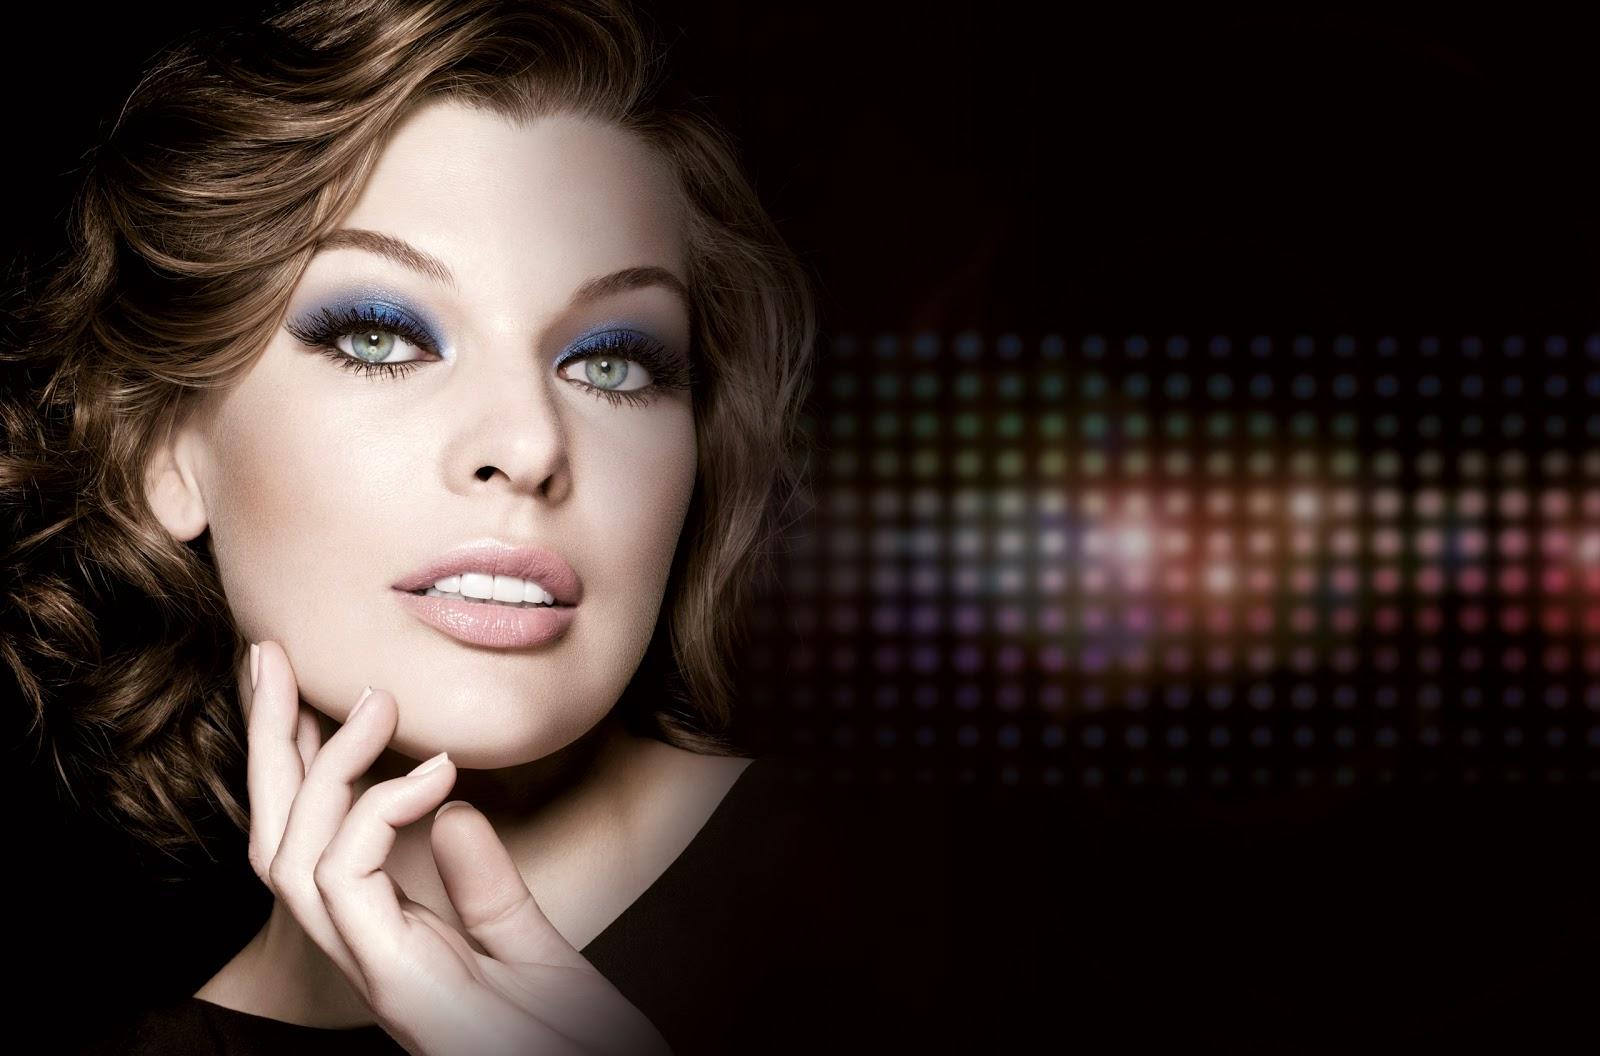 http://2.bp.blogspot.com/-Zl7zMZsWizI/TcewSXicY1I/AAAAAAAADuM/E8788a3f2Yk/s1600/Milla+Jovovich_Loreal.jpg